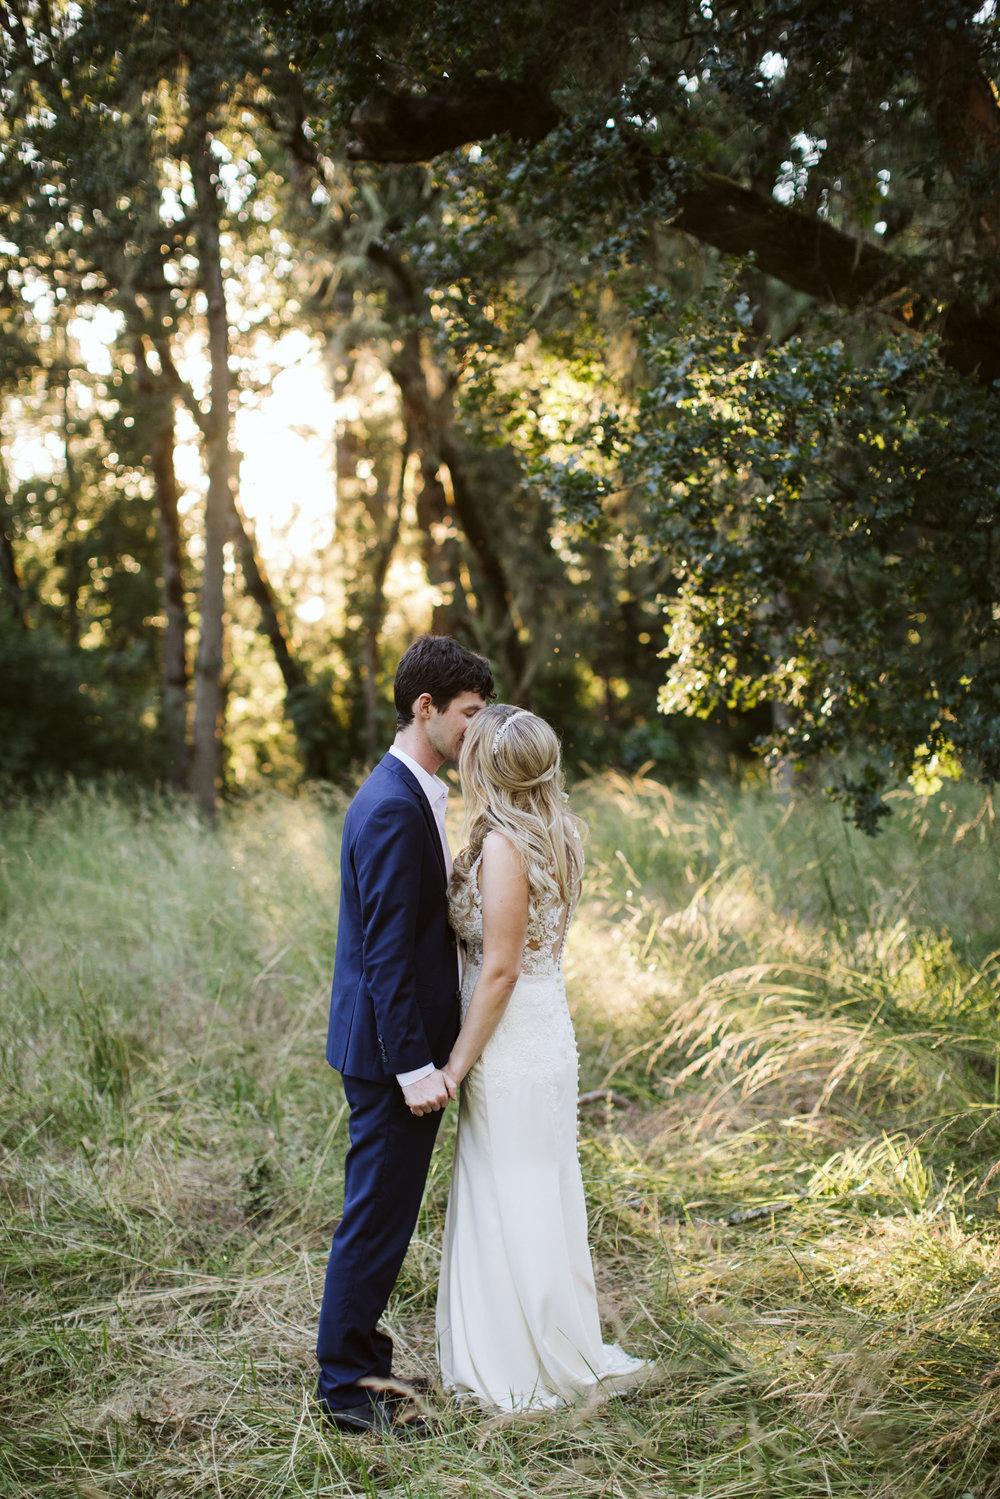 124-daronjackson-rachel-michael-wedding-mtpisgah.jpg